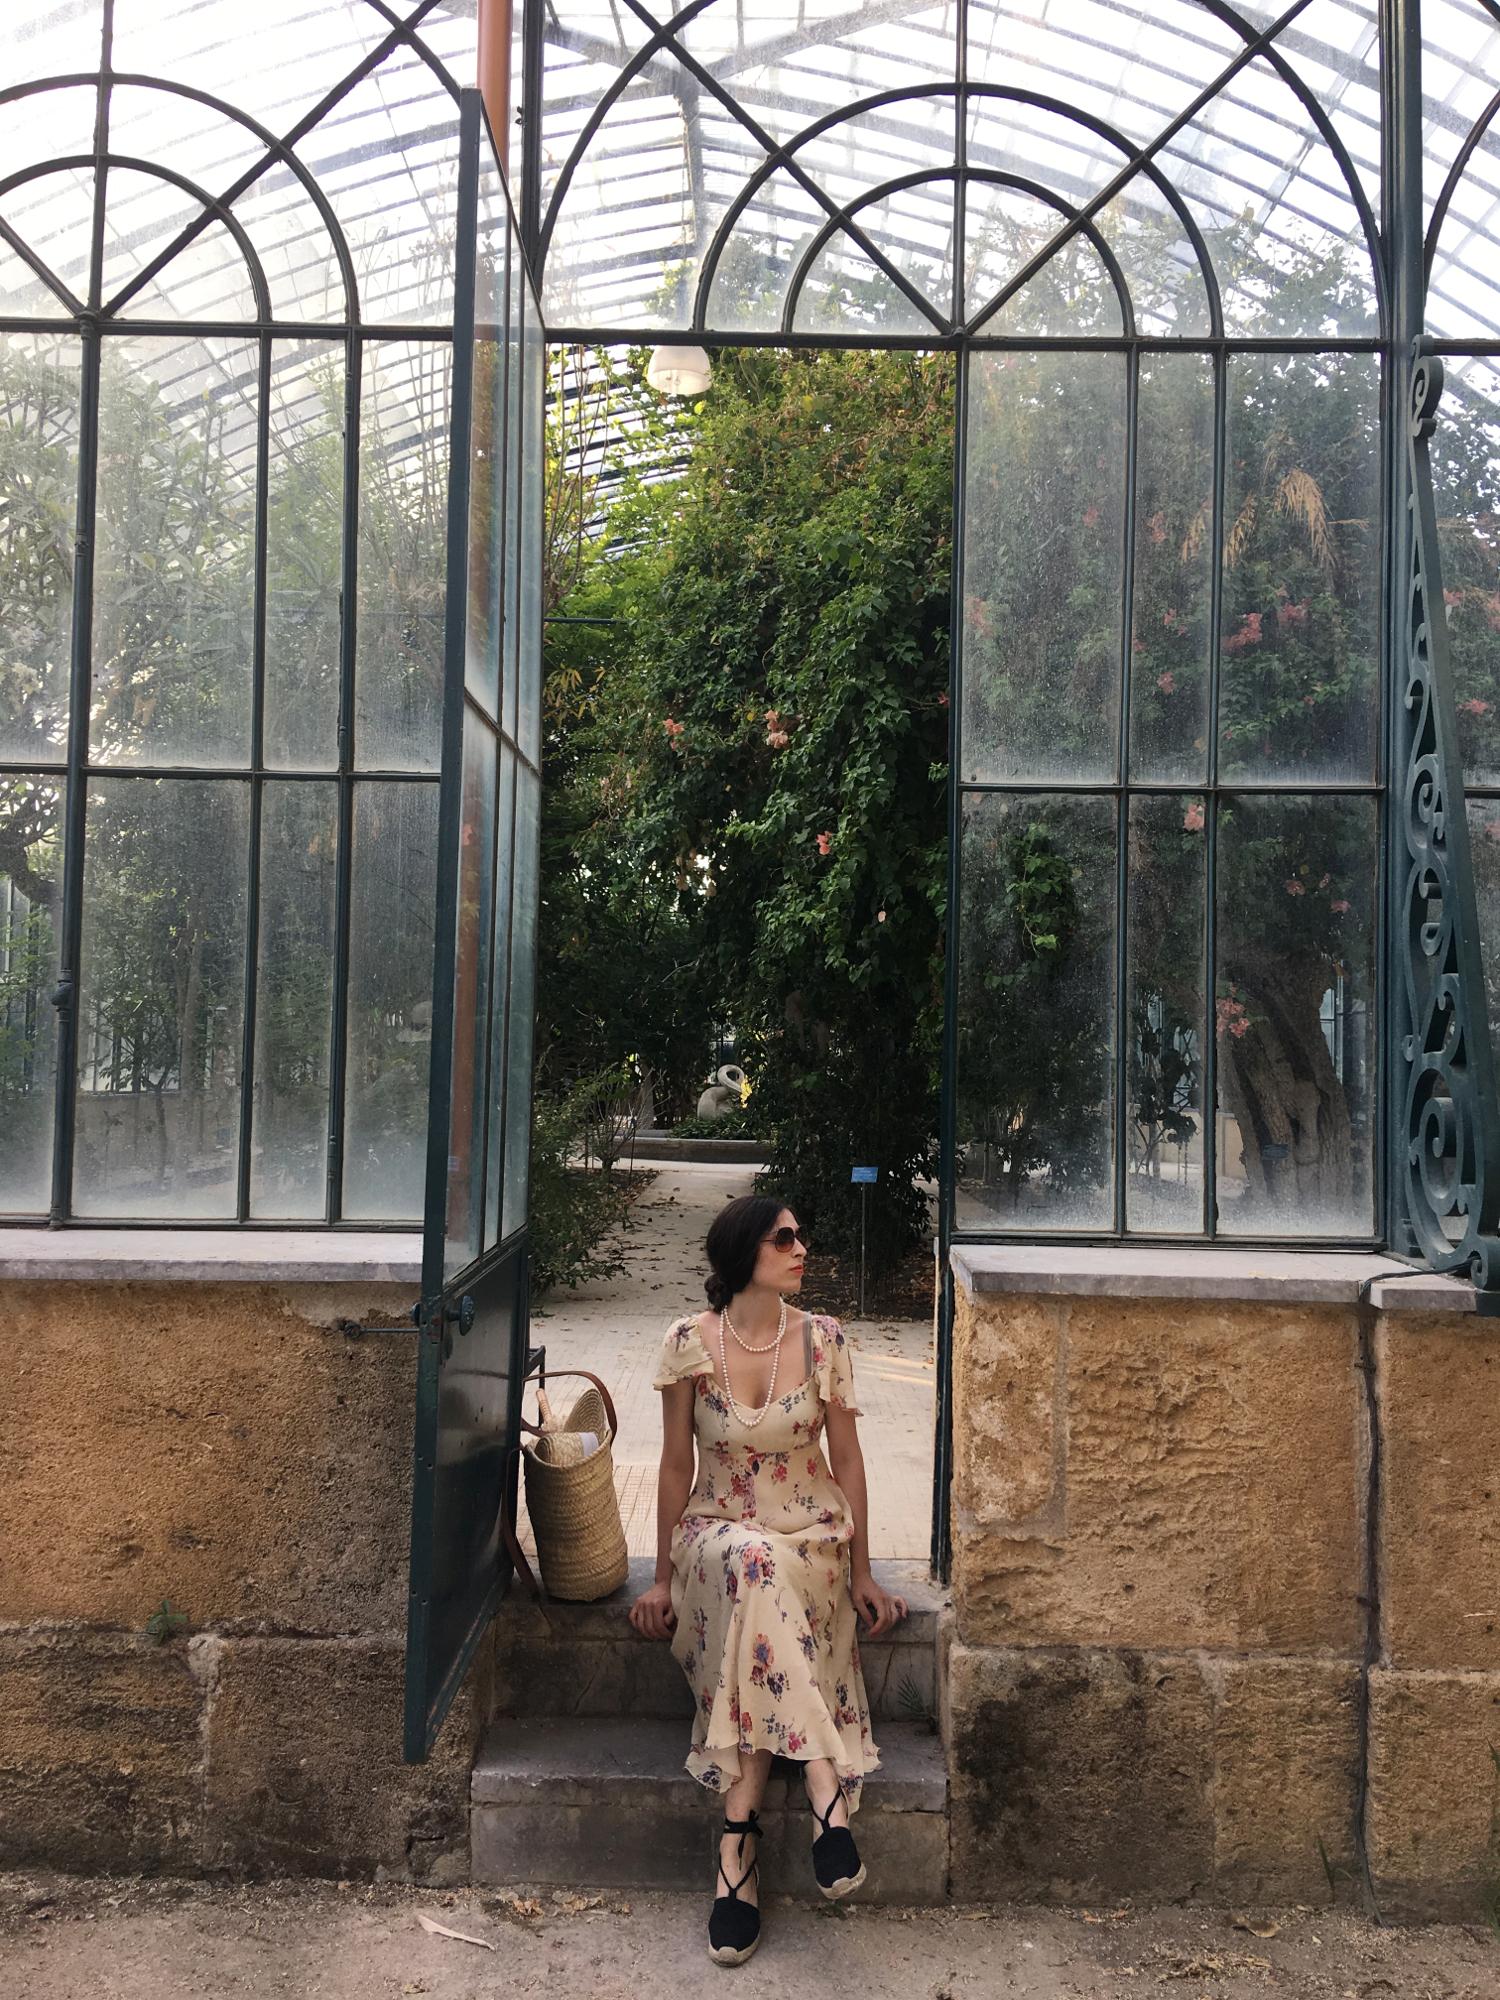 rocaille-blog-palermo-orto-botanico-botanical-garden-28